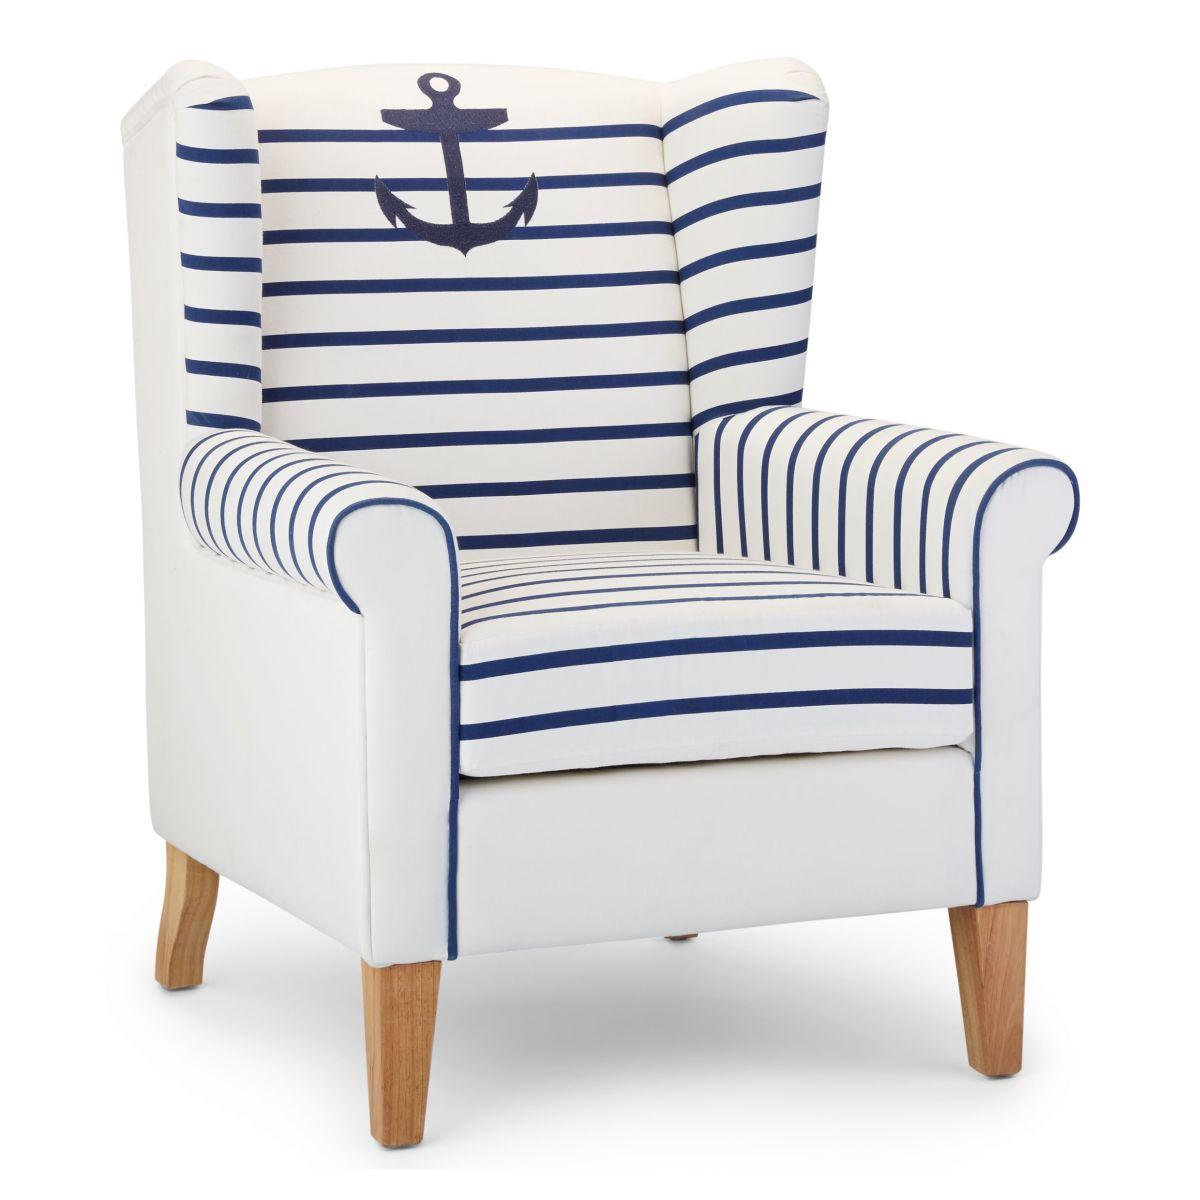 anker sessel maritim versandkostenfreie m bel online bestellen. Black Bedroom Furniture Sets. Home Design Ideas